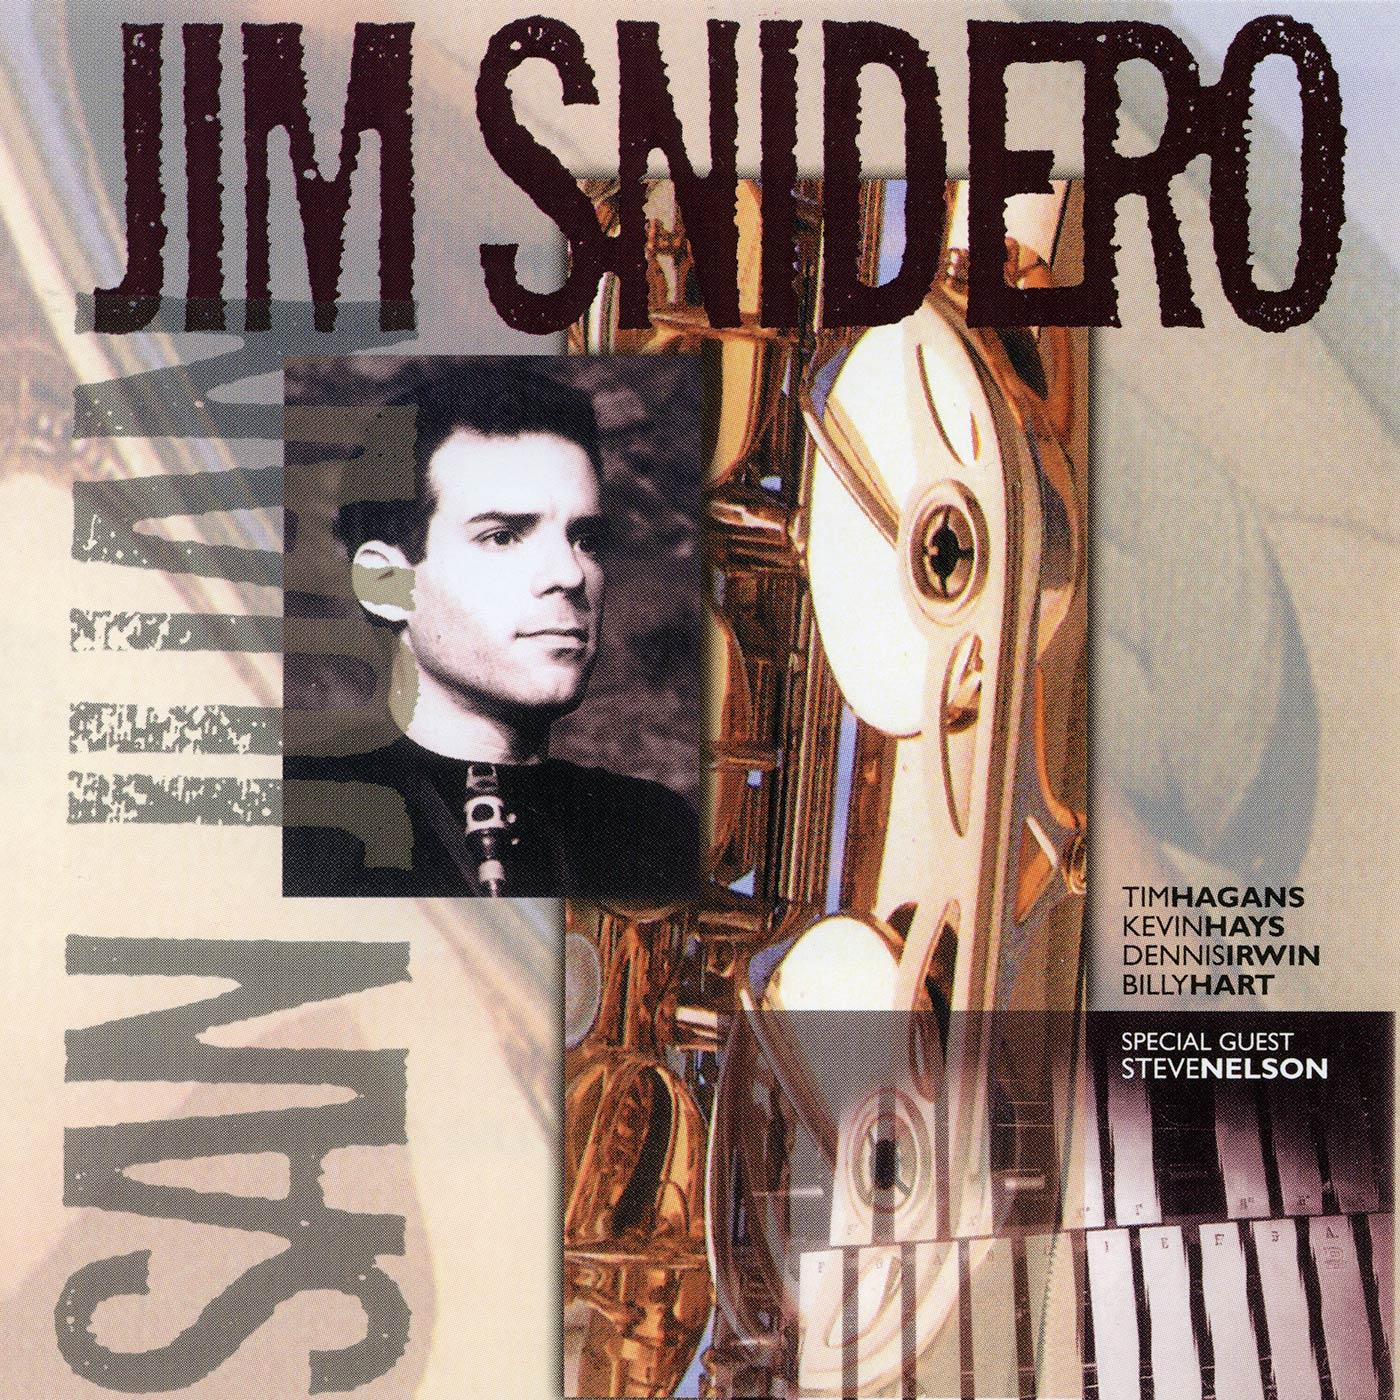 San Juan - Jim Snidero